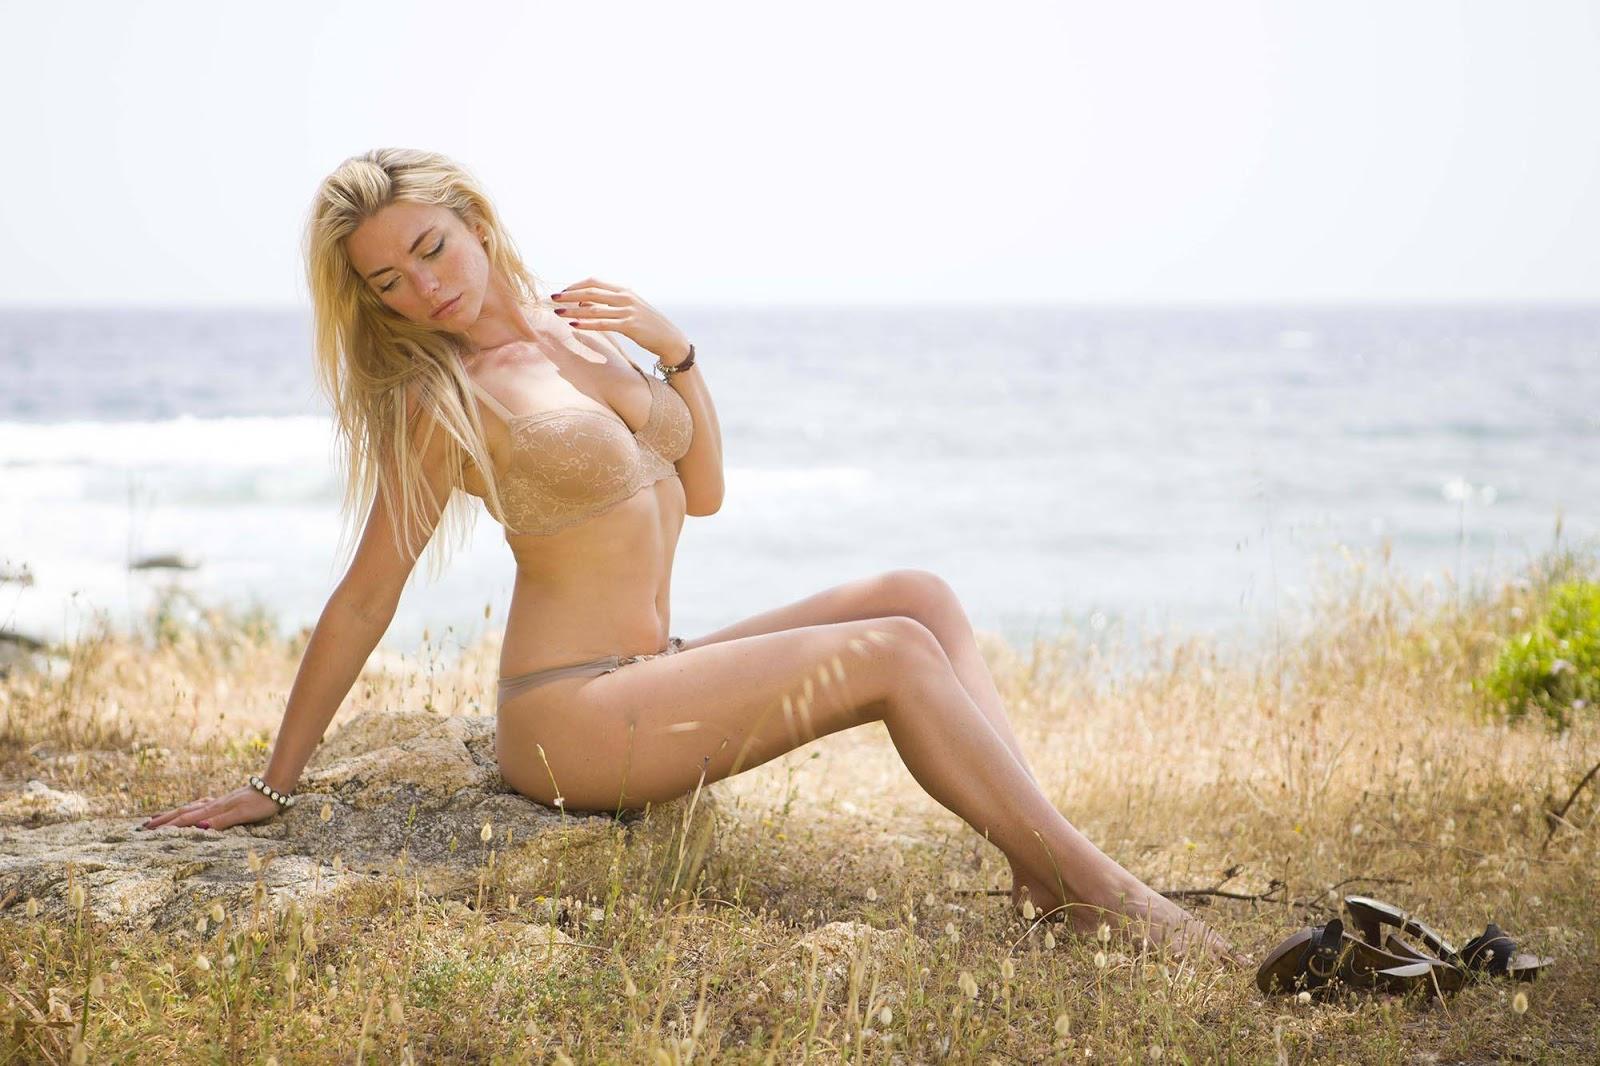 April summer naked ozawa sex idol